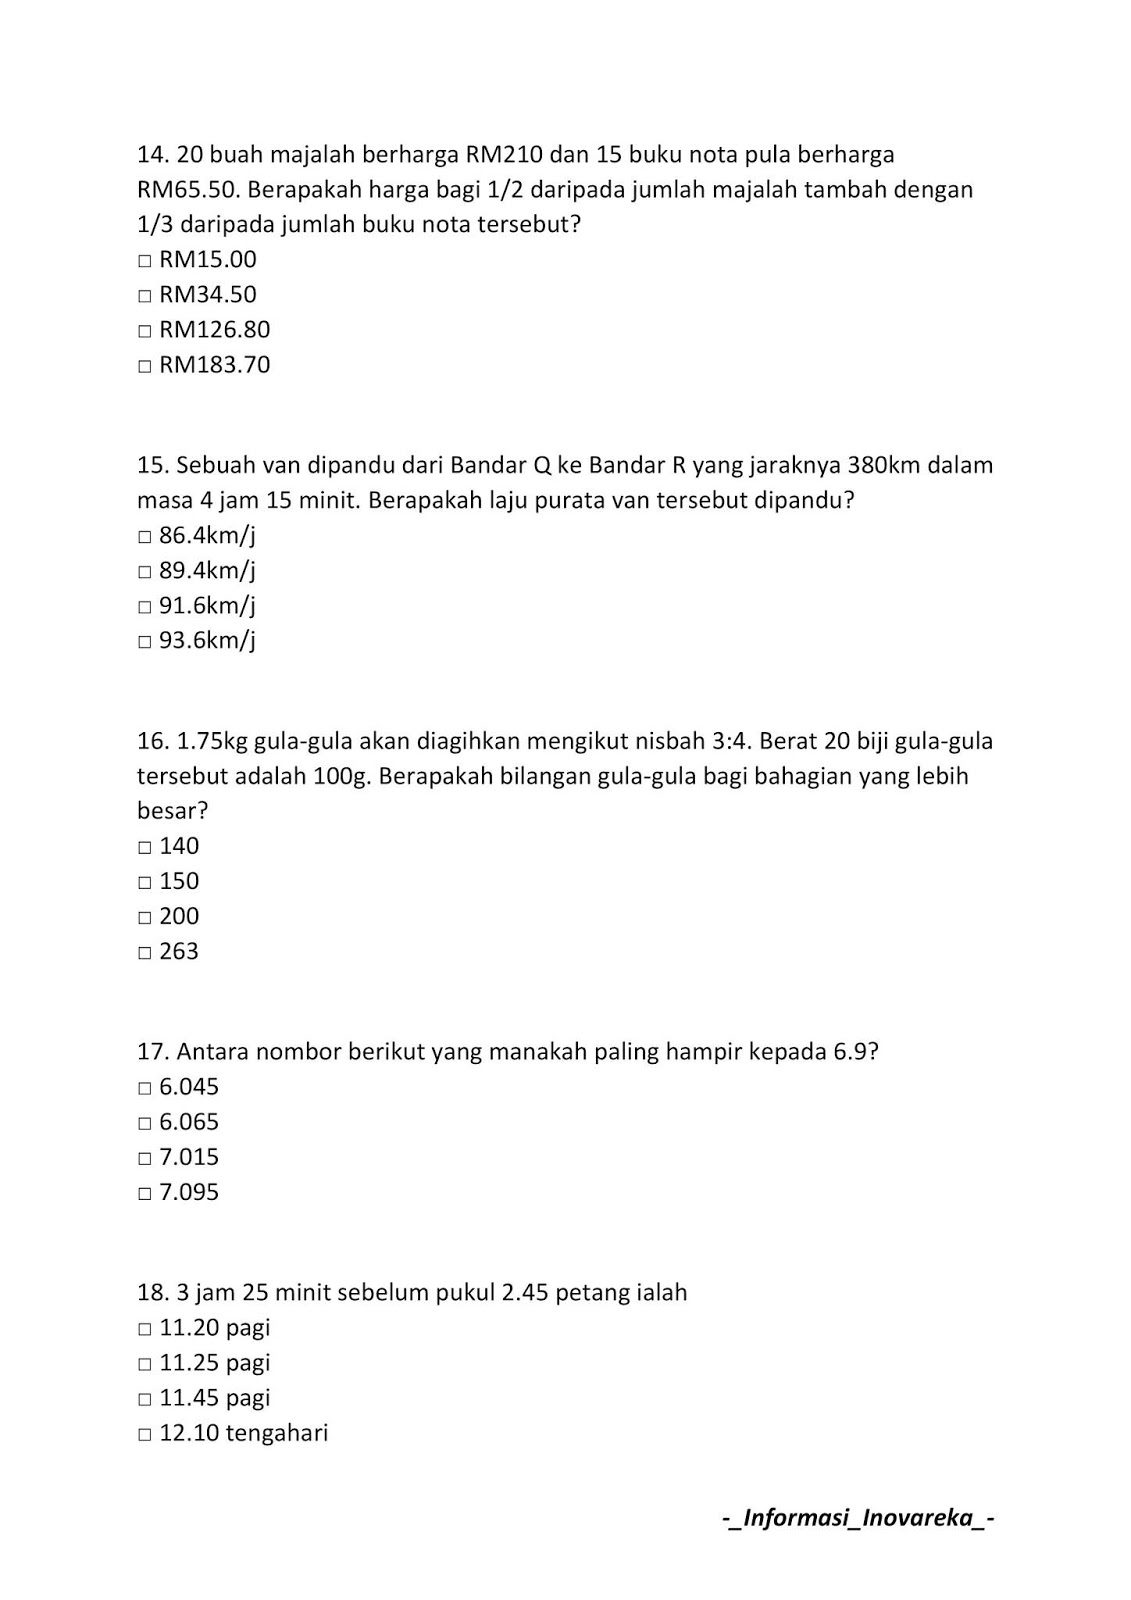 Contoh Soalan Peperiksaan Spa Pembantu Operasi N11 2019